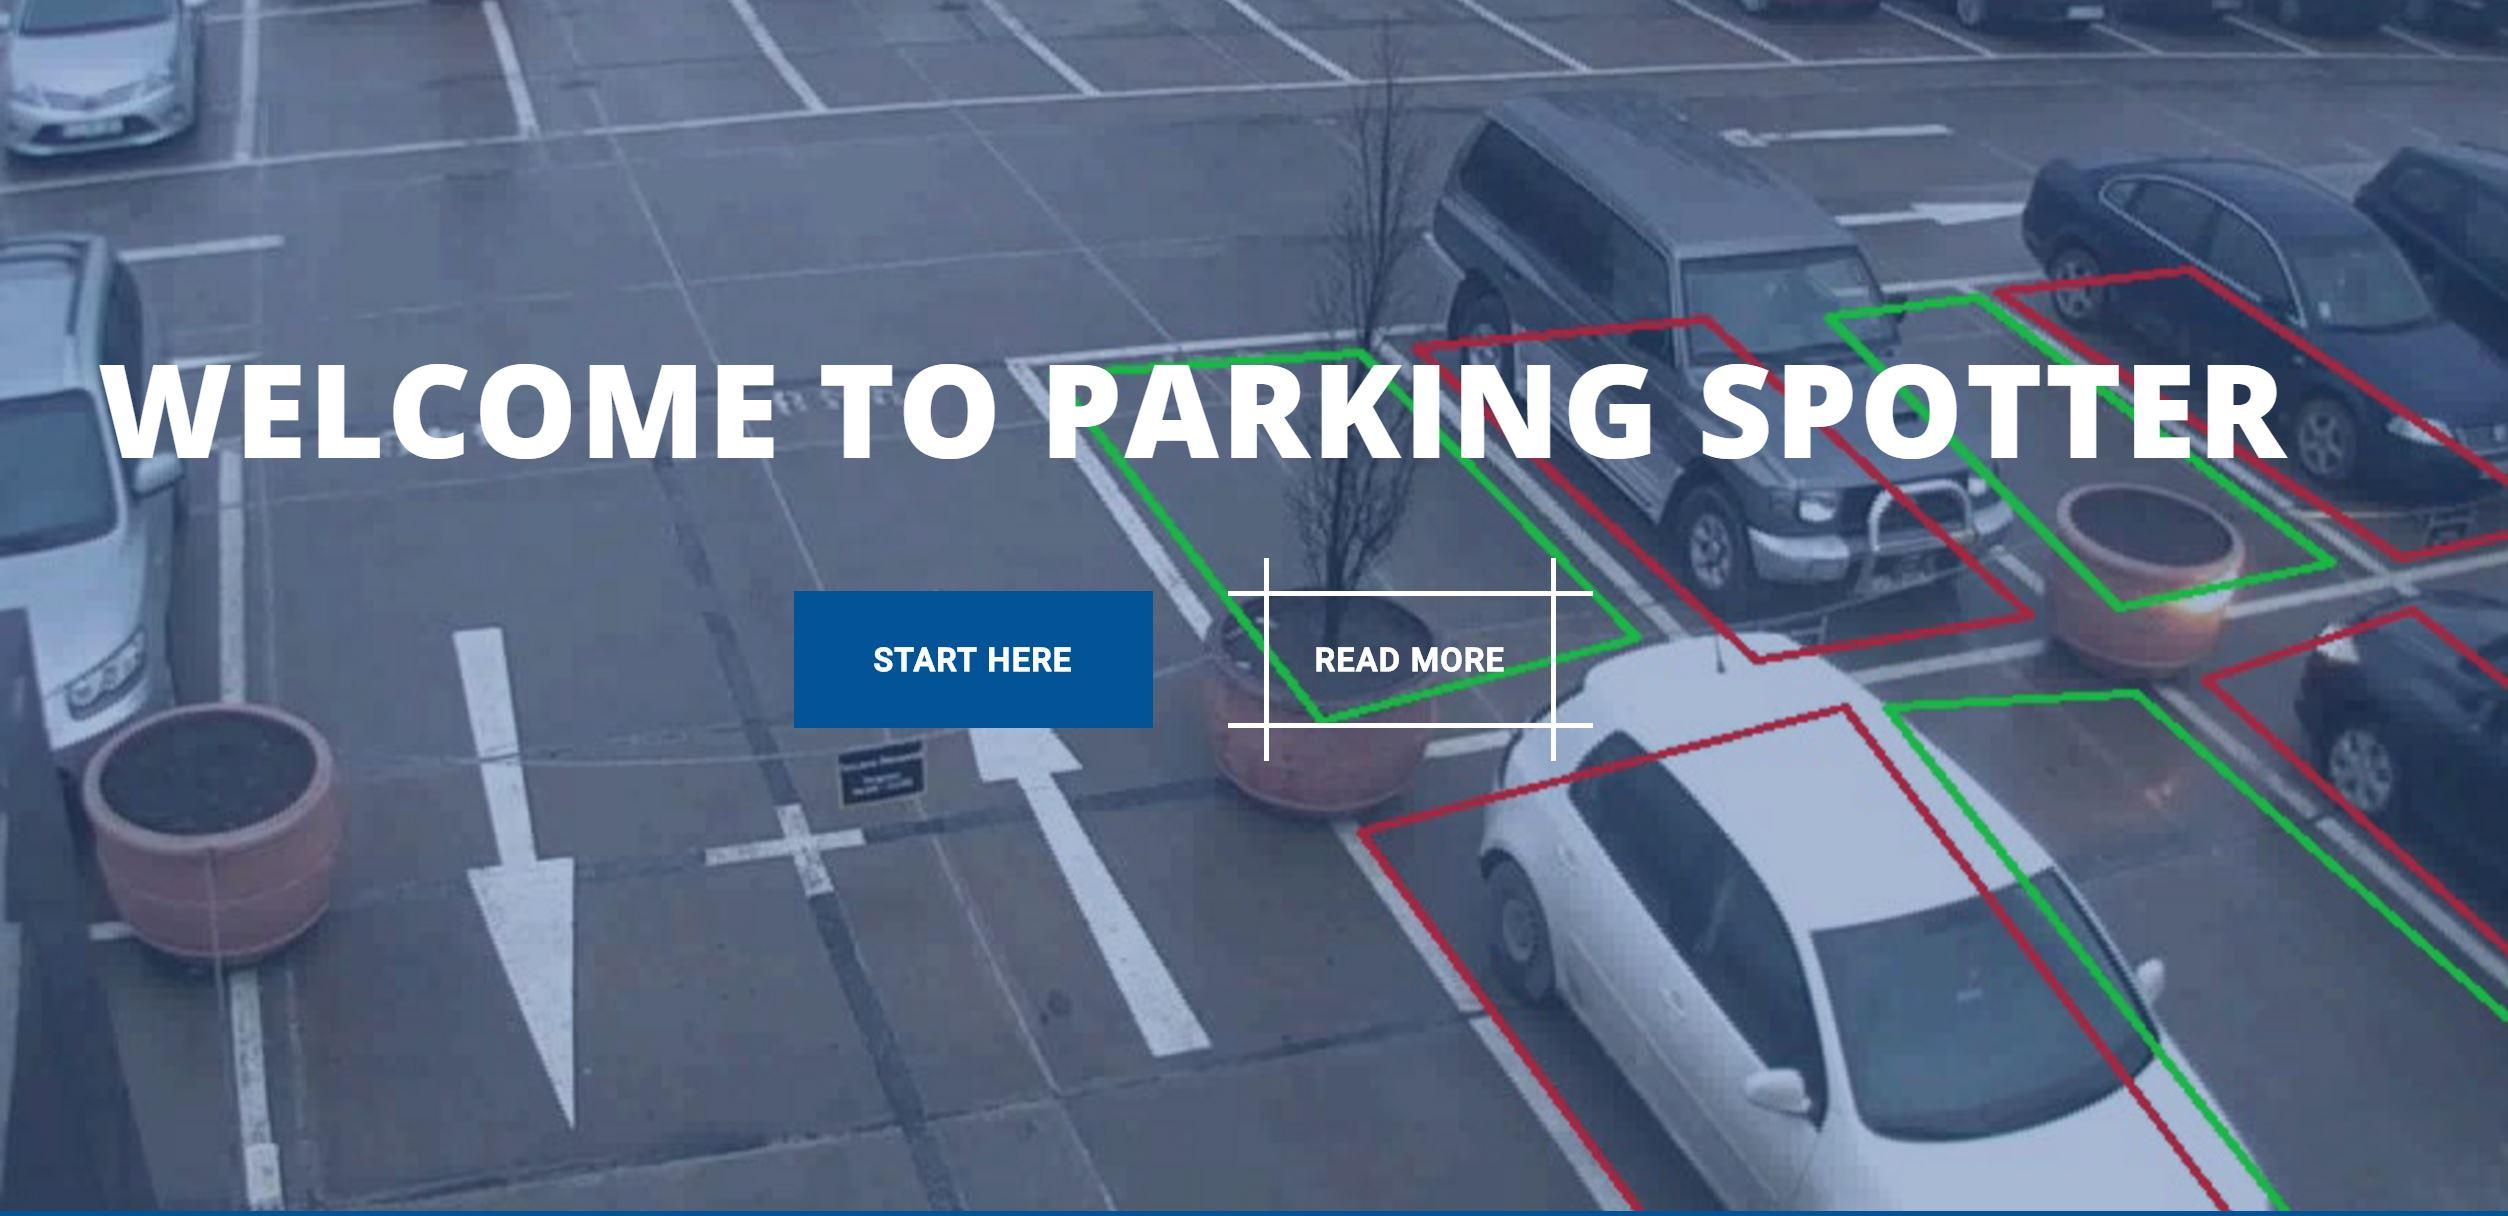 parking spotter san antonio milestone startup